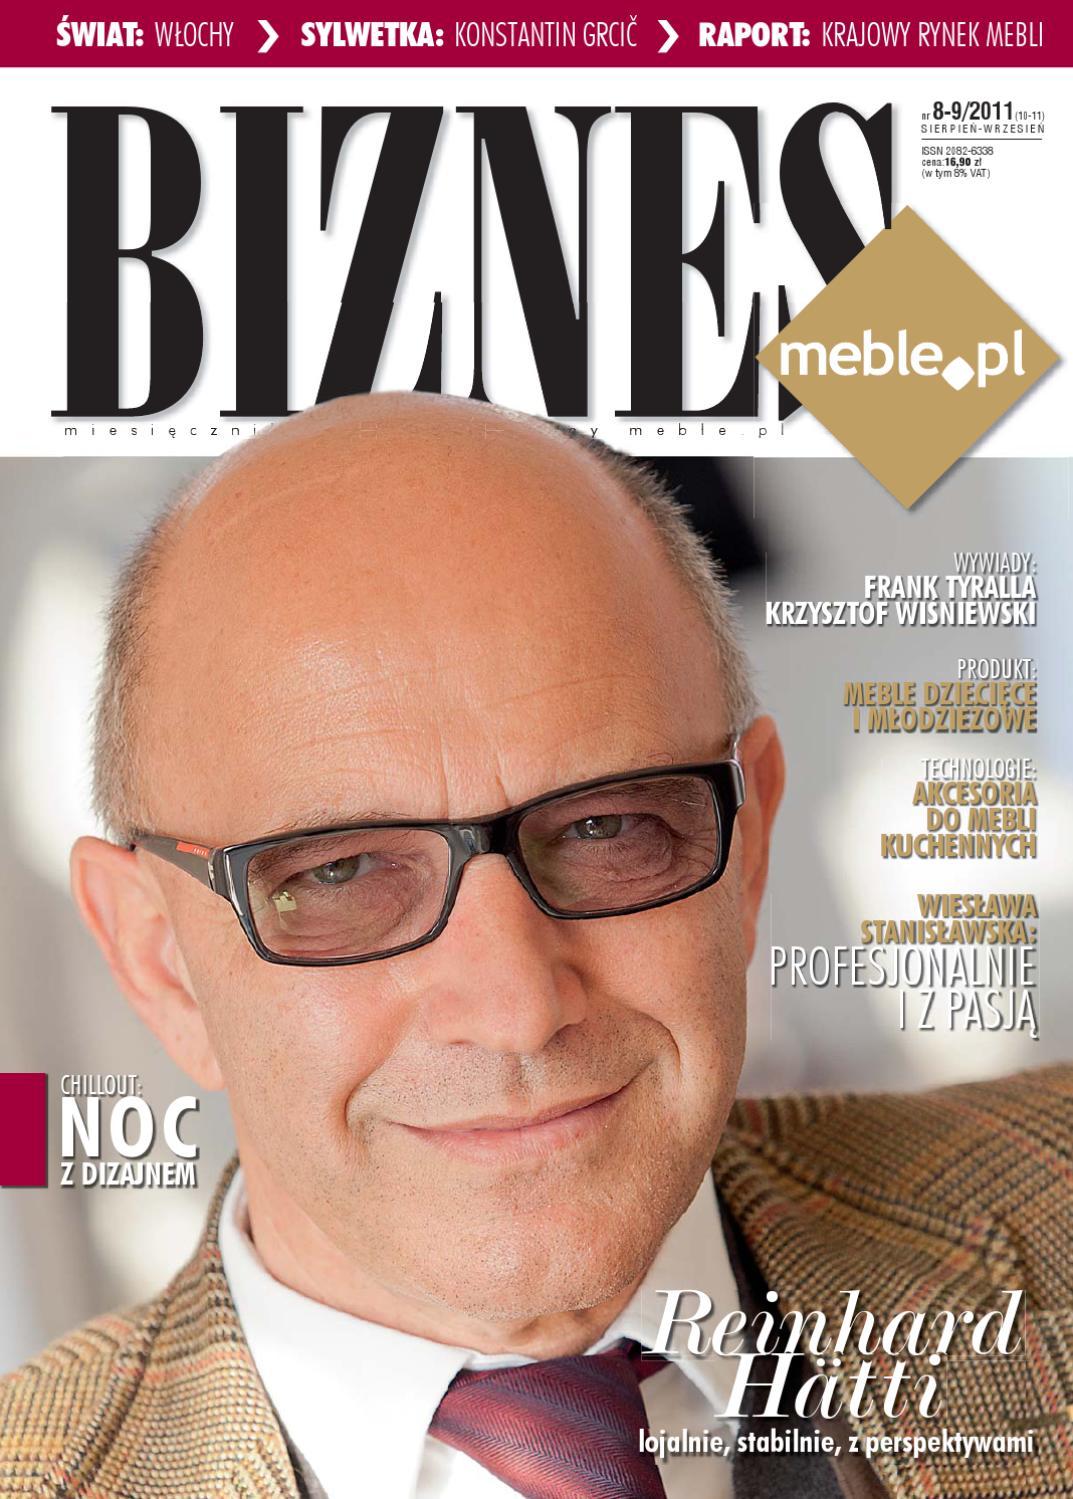 BIZNES meble.pl by Wydawnictwo meble.pl sp. z o.o. - issuu